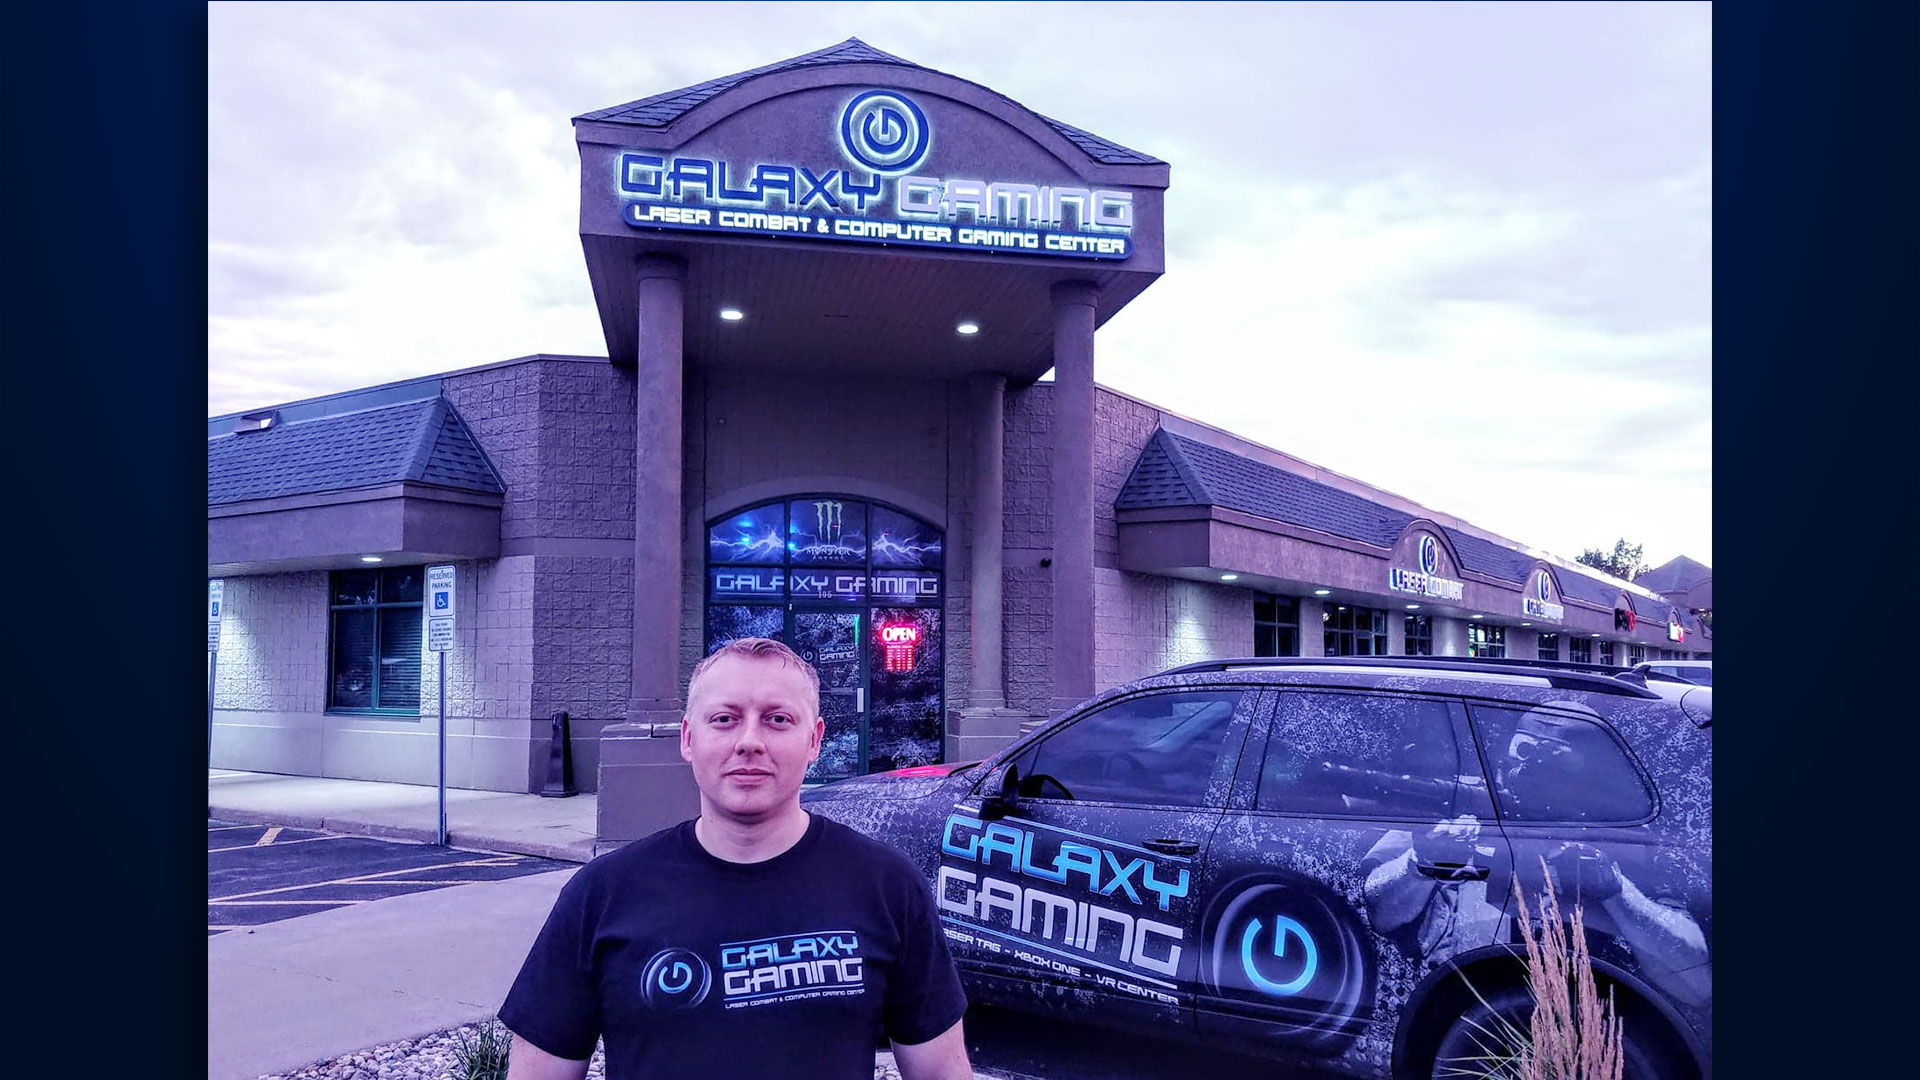 KELO Galaxy Gaming